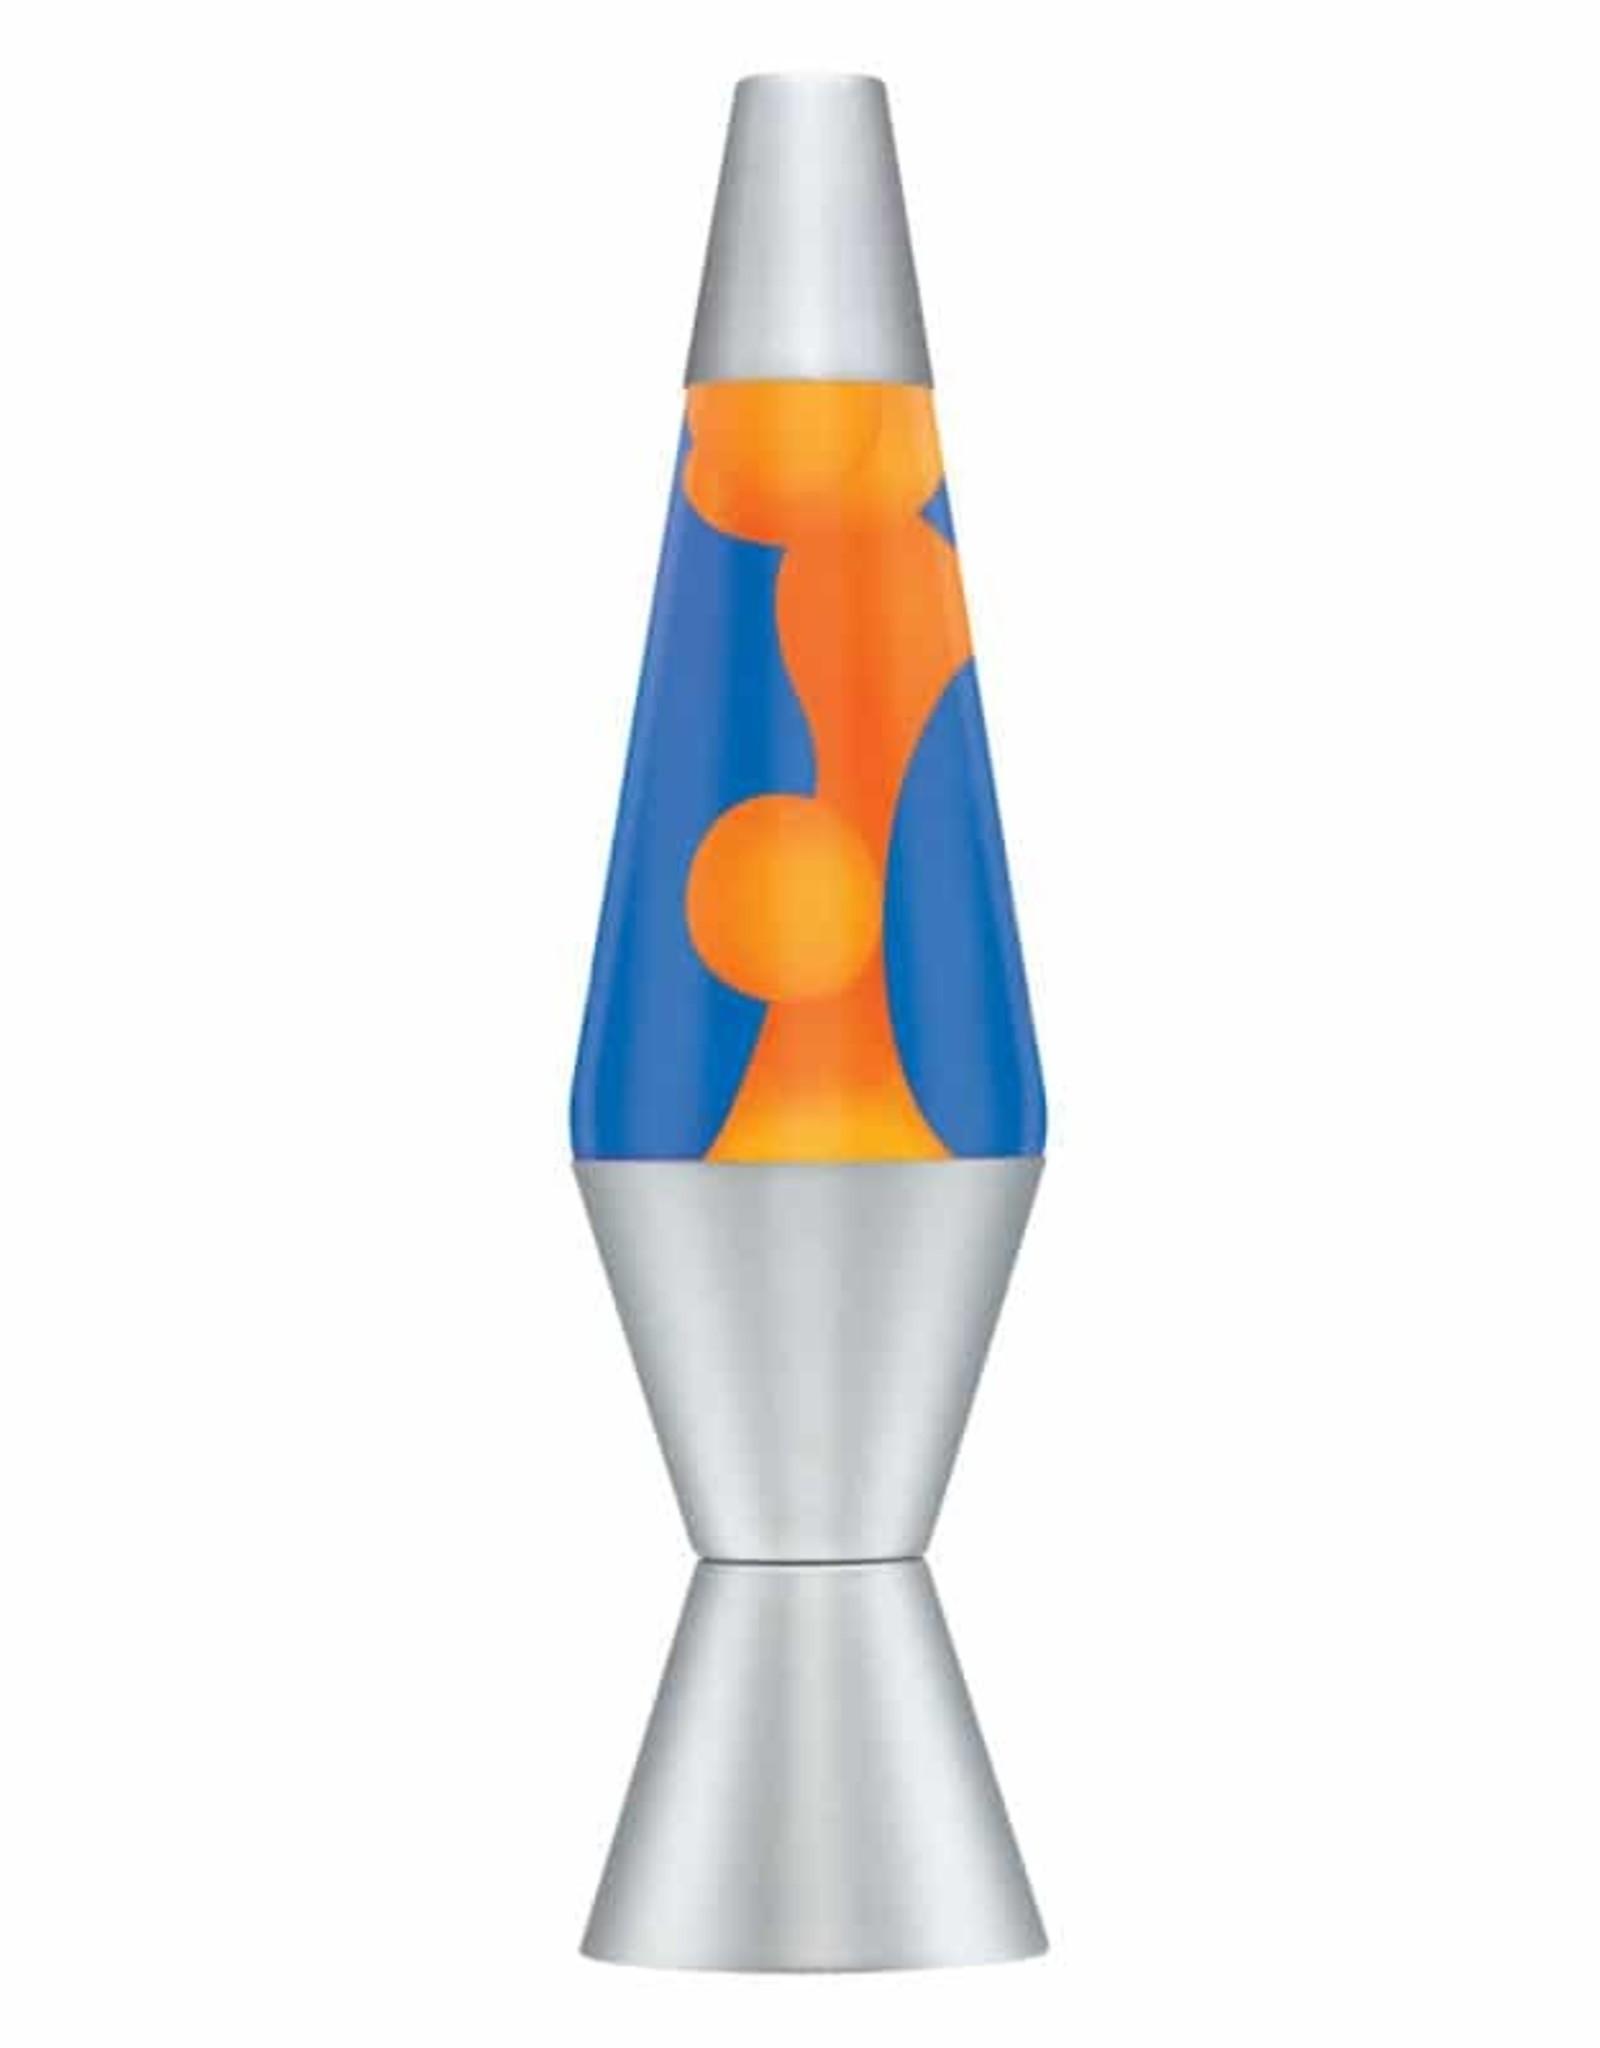 Lava Lamp 14.5'' Lava Lamp - ORANGE/BLUE/SILVER